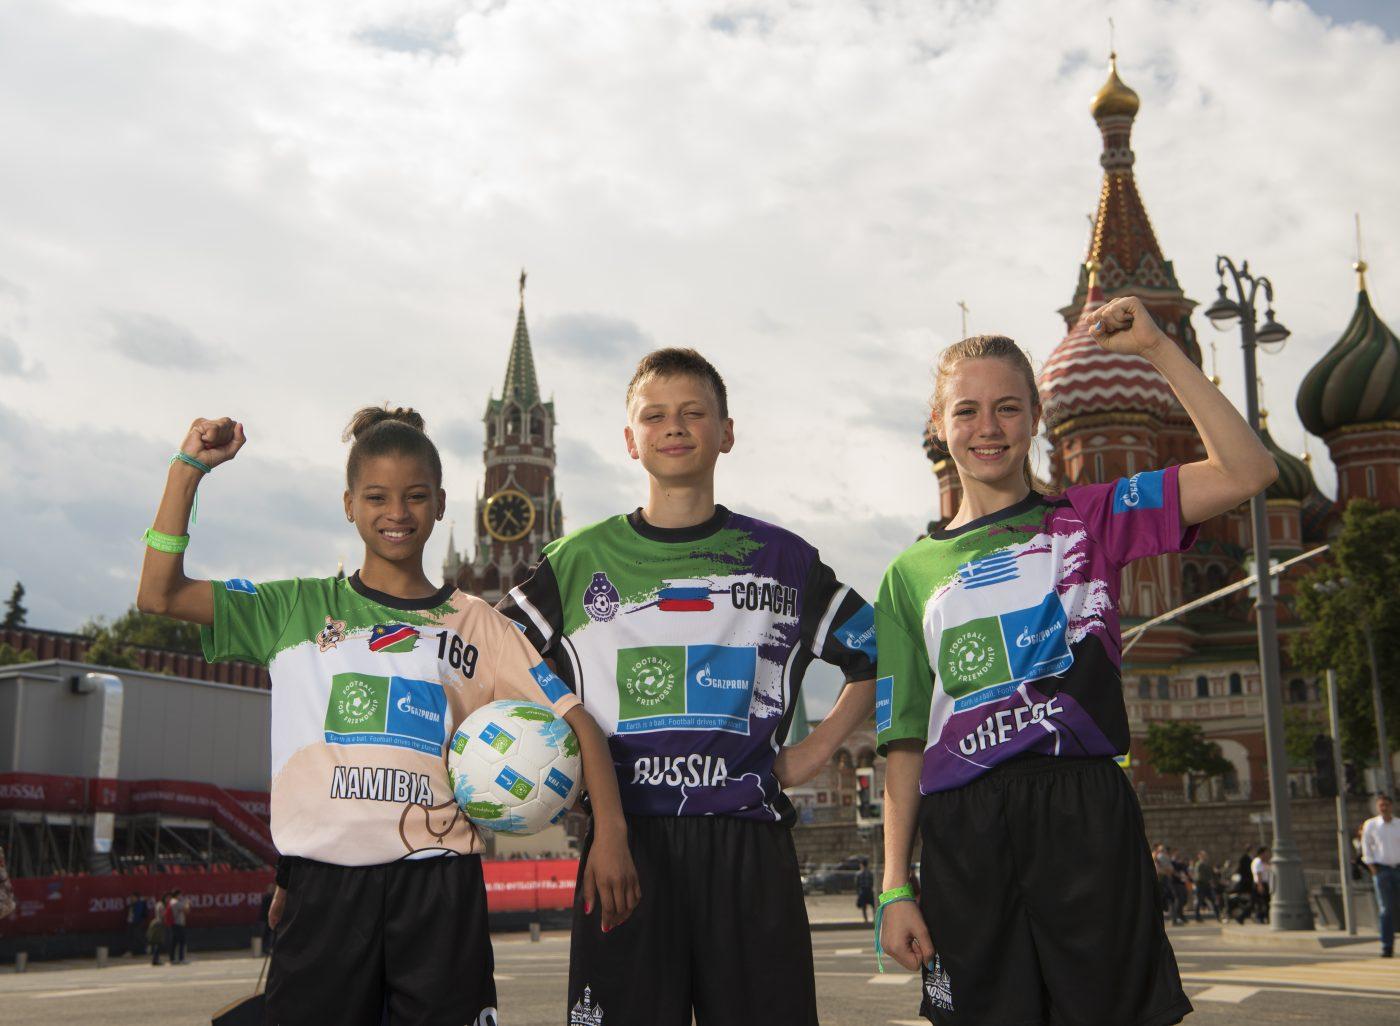 football-pour-amitie-programme-uefa-fifa-gazprom-3